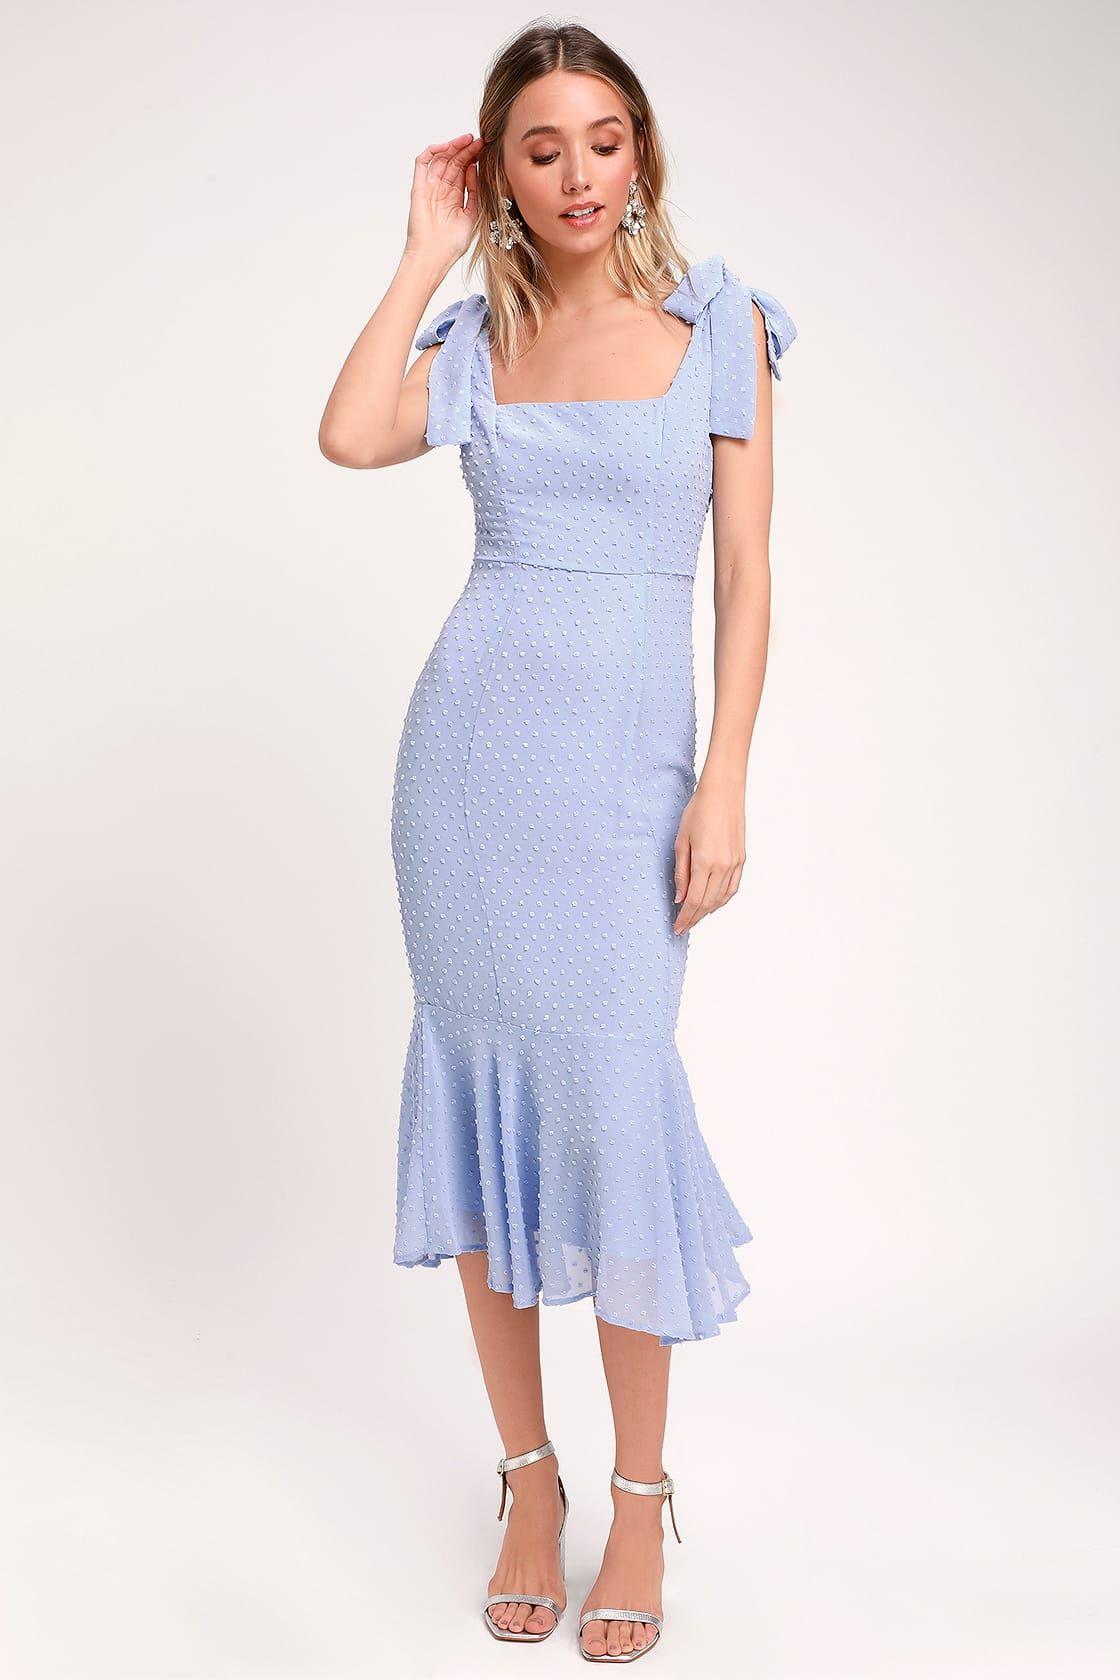 Bimini Periwinkle Blue Swiss Dot Tie Strap Midi Dress Periwinkle Blue Dress Periwinkle Dress Dresses [ 1680 x 1120 Pixel ]